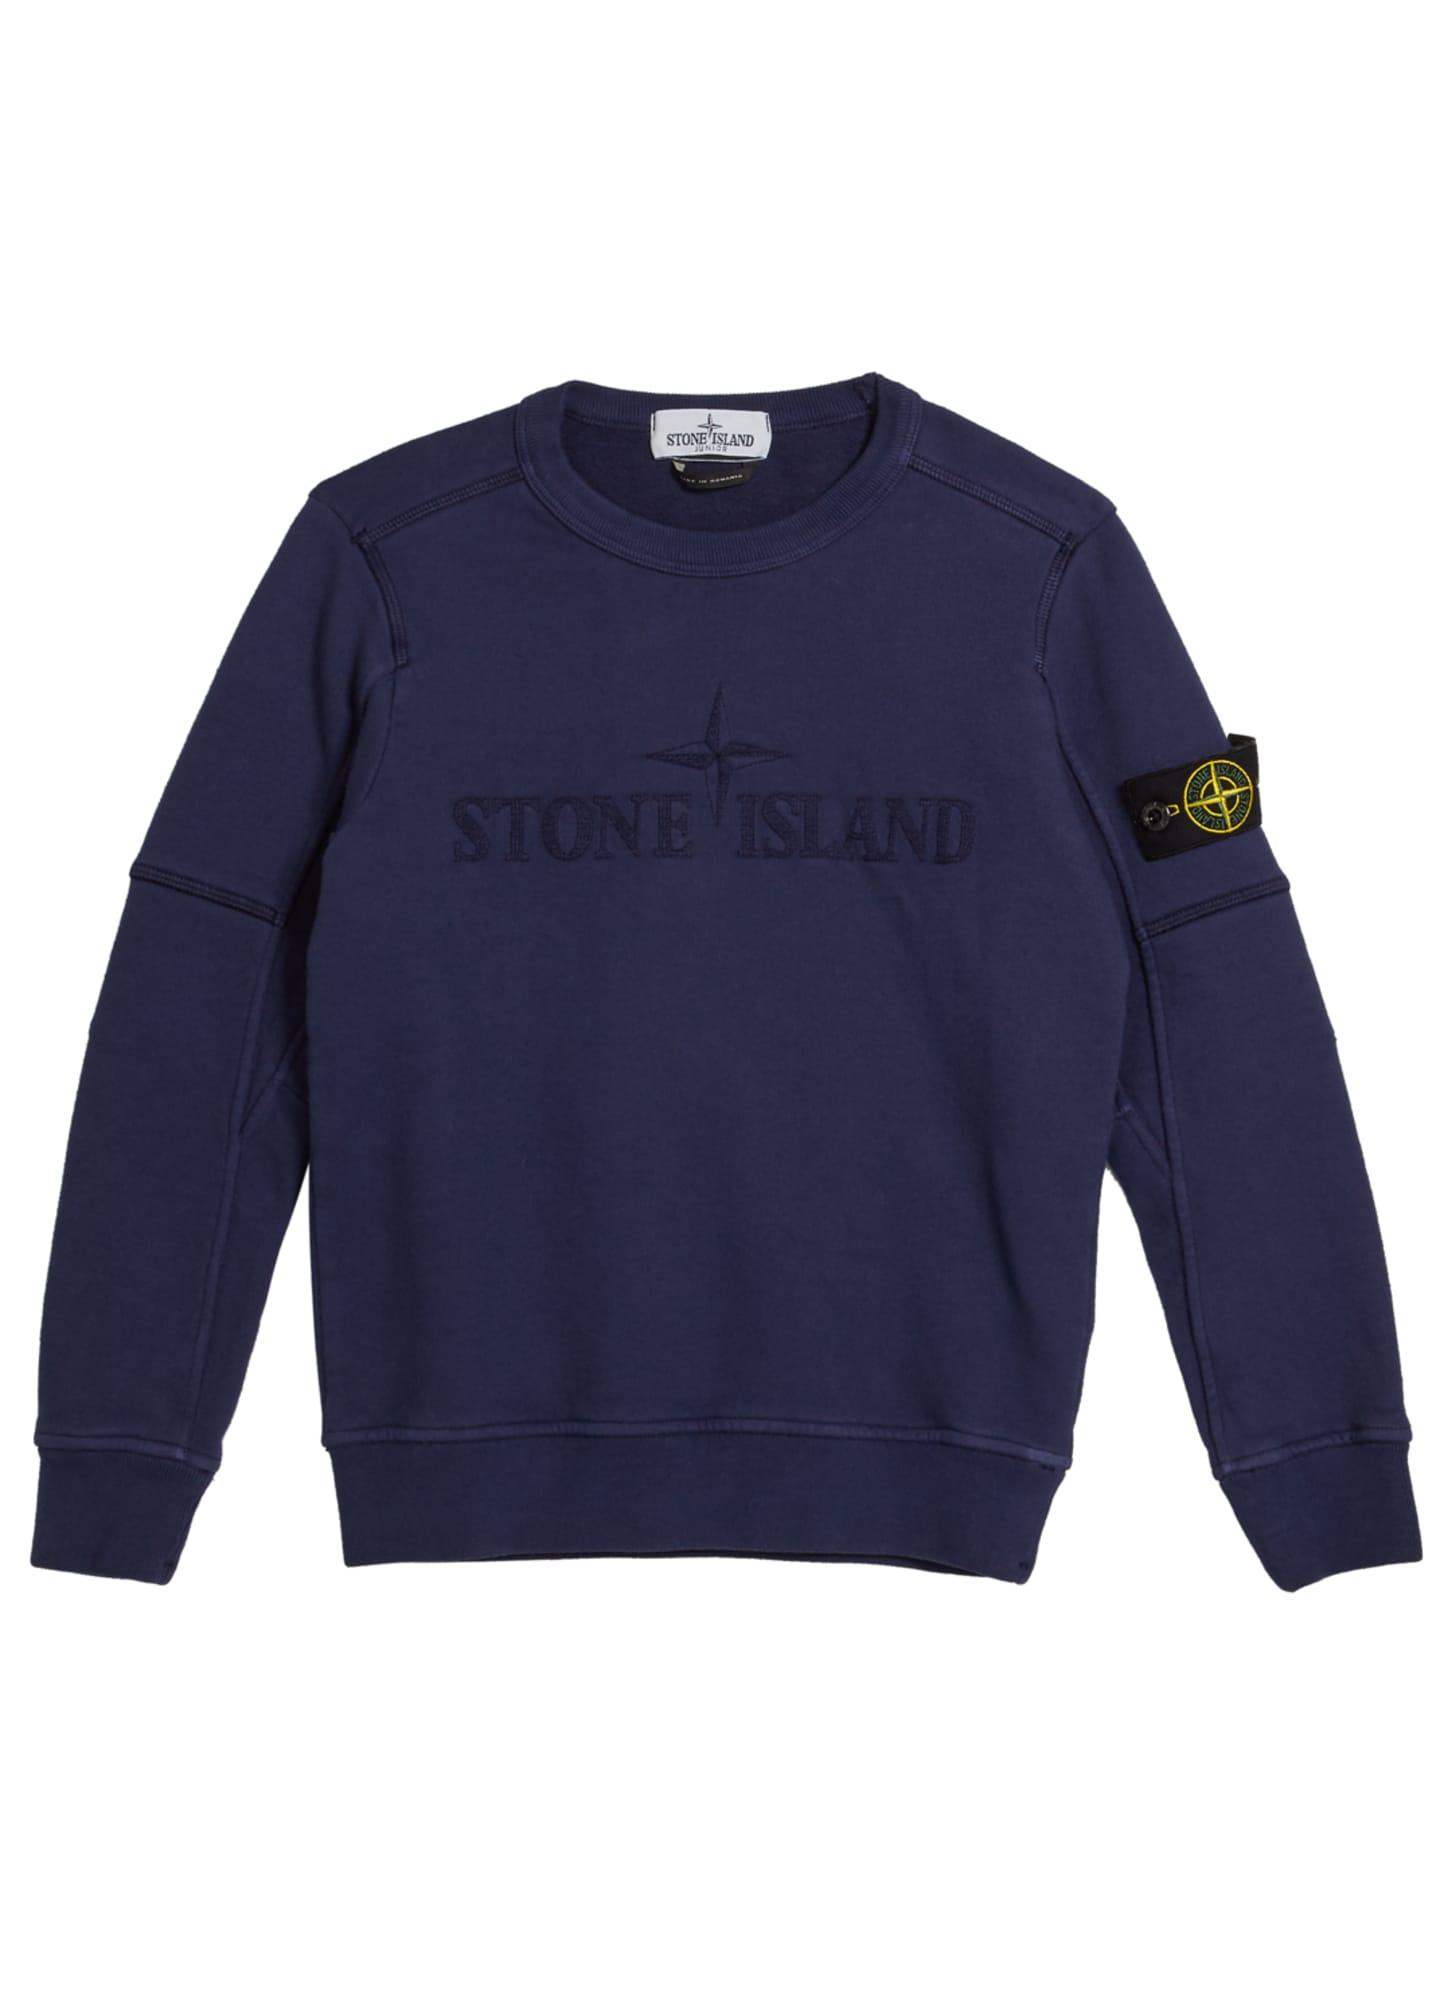 Stone Island Logo Embroidered Sweatshirt, Size 2-6